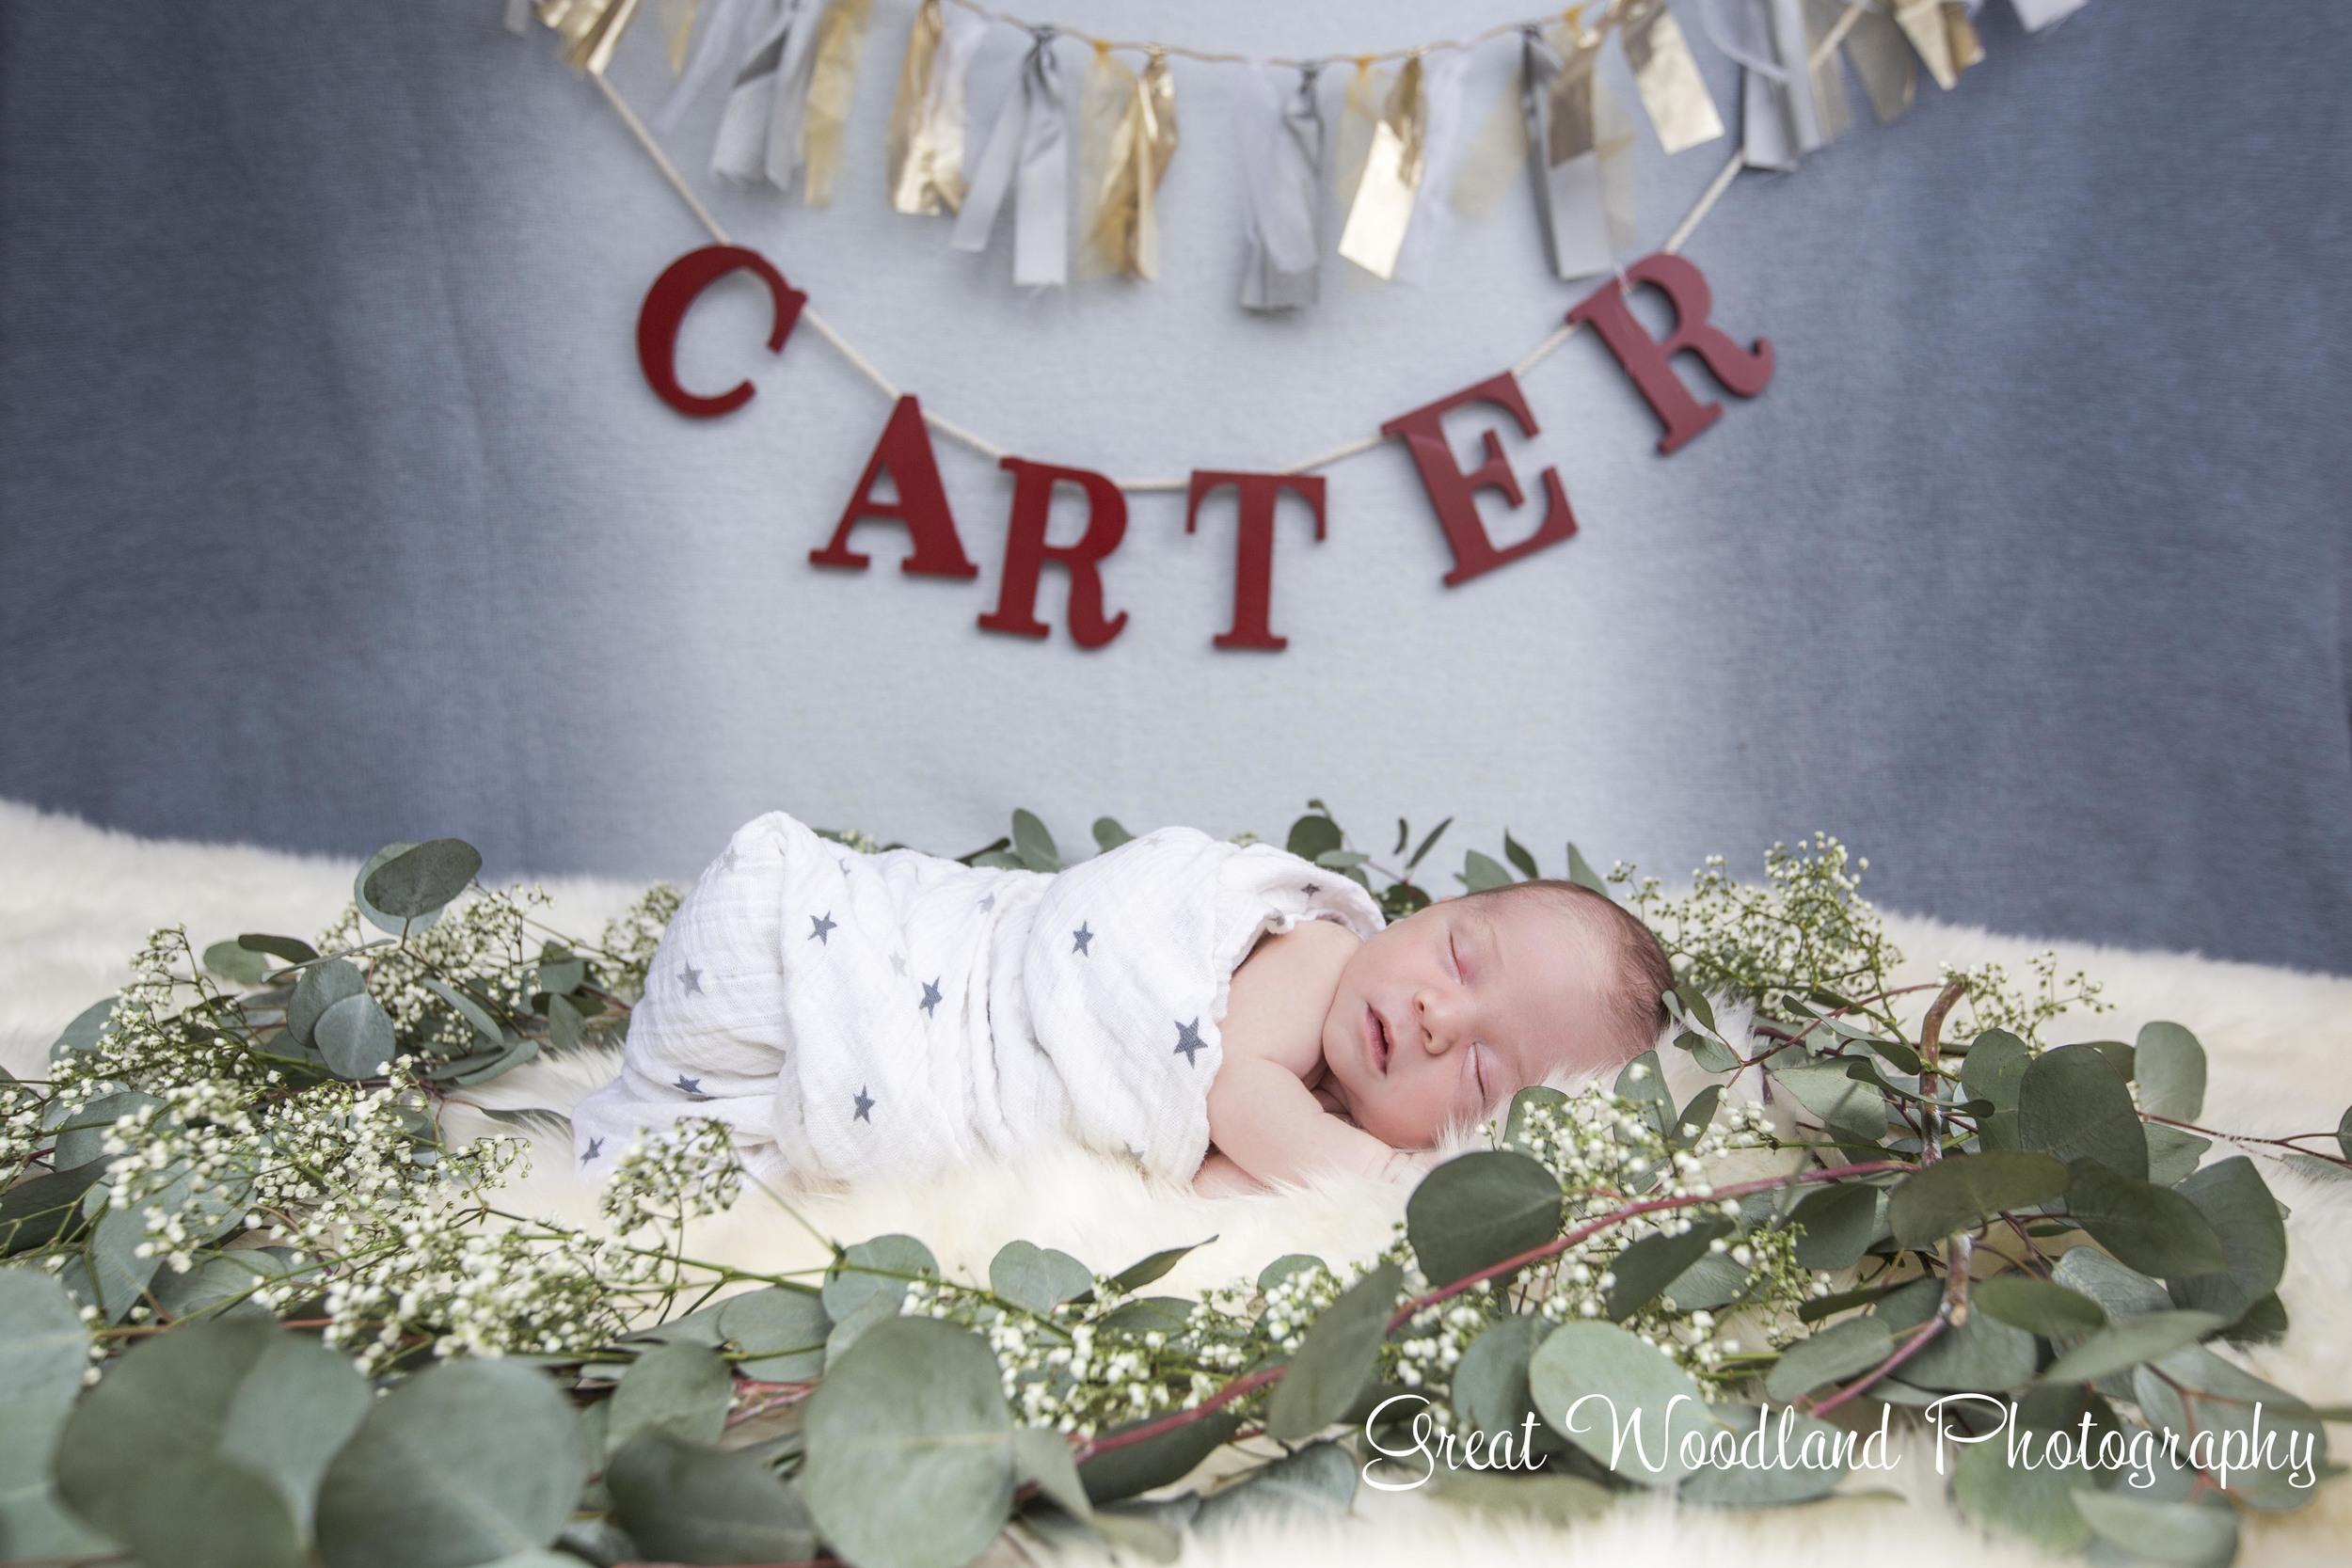 Carter-16.jpg